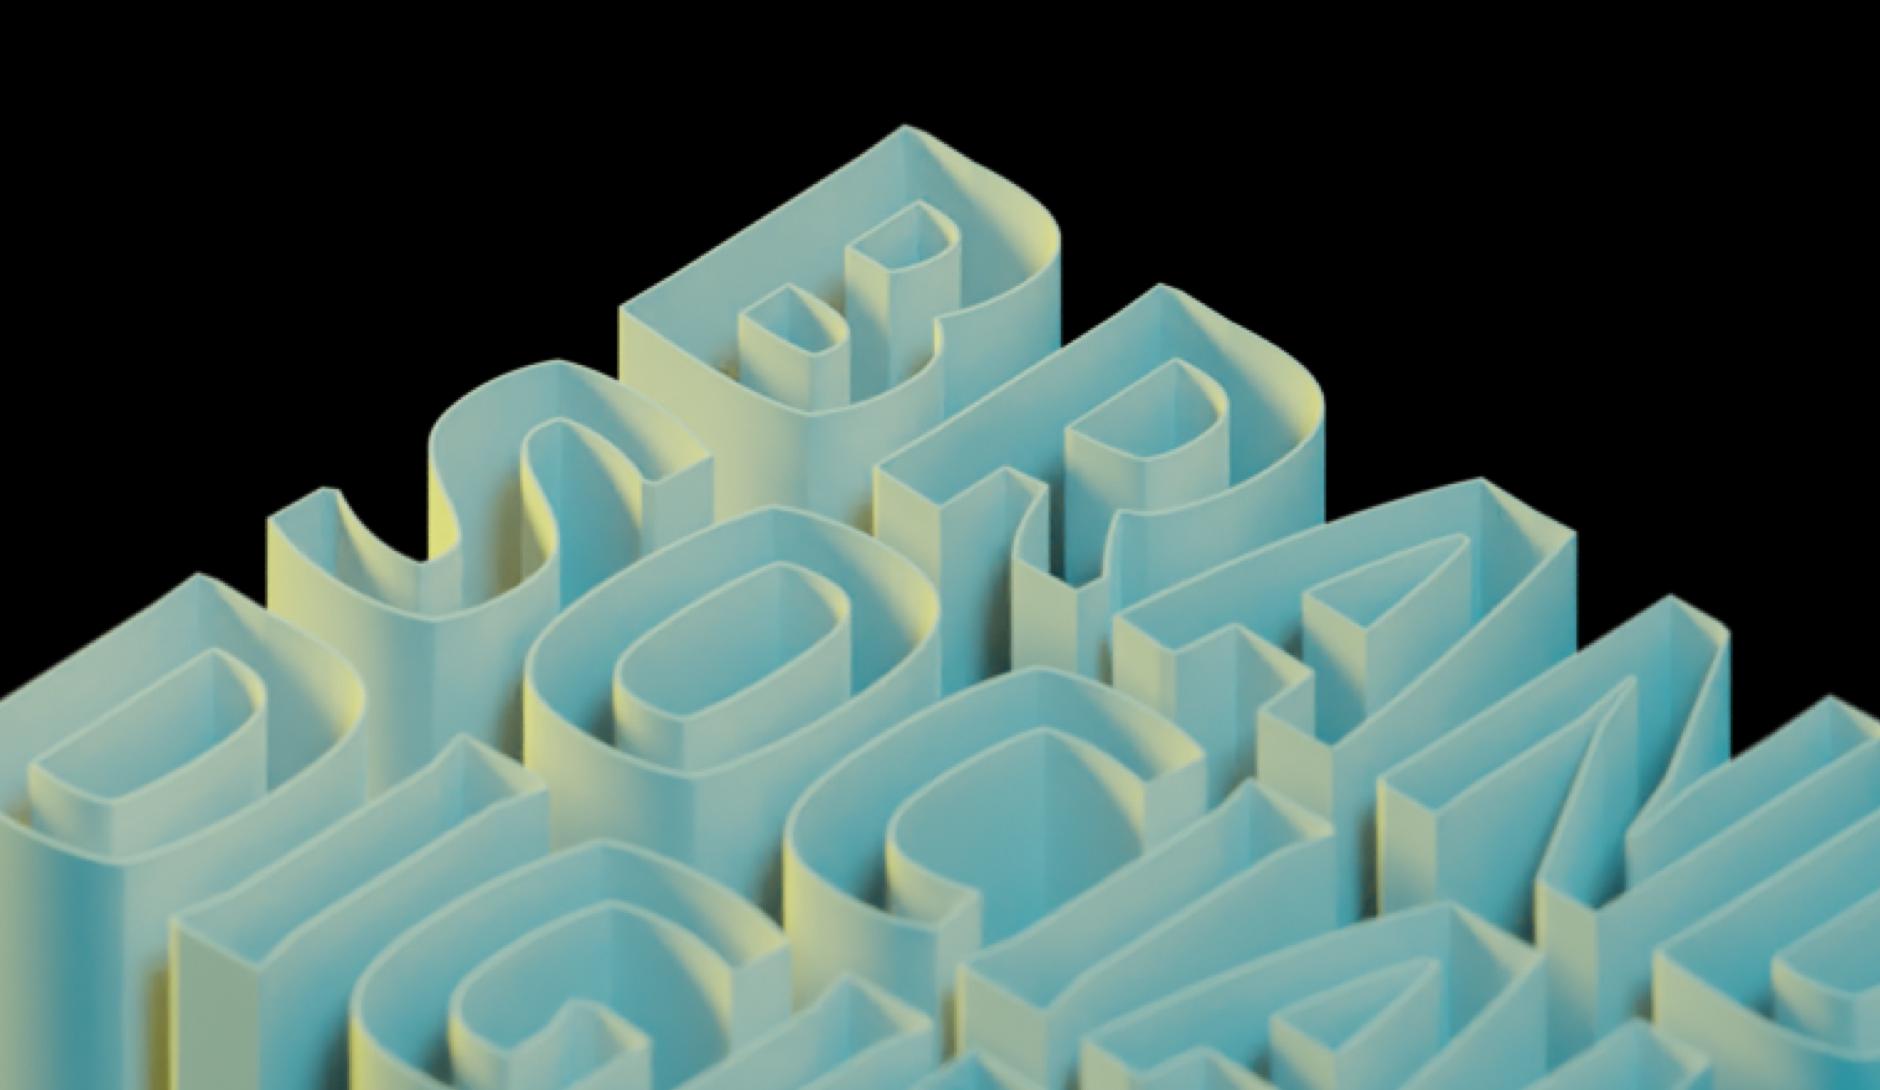 Syntax Prototype